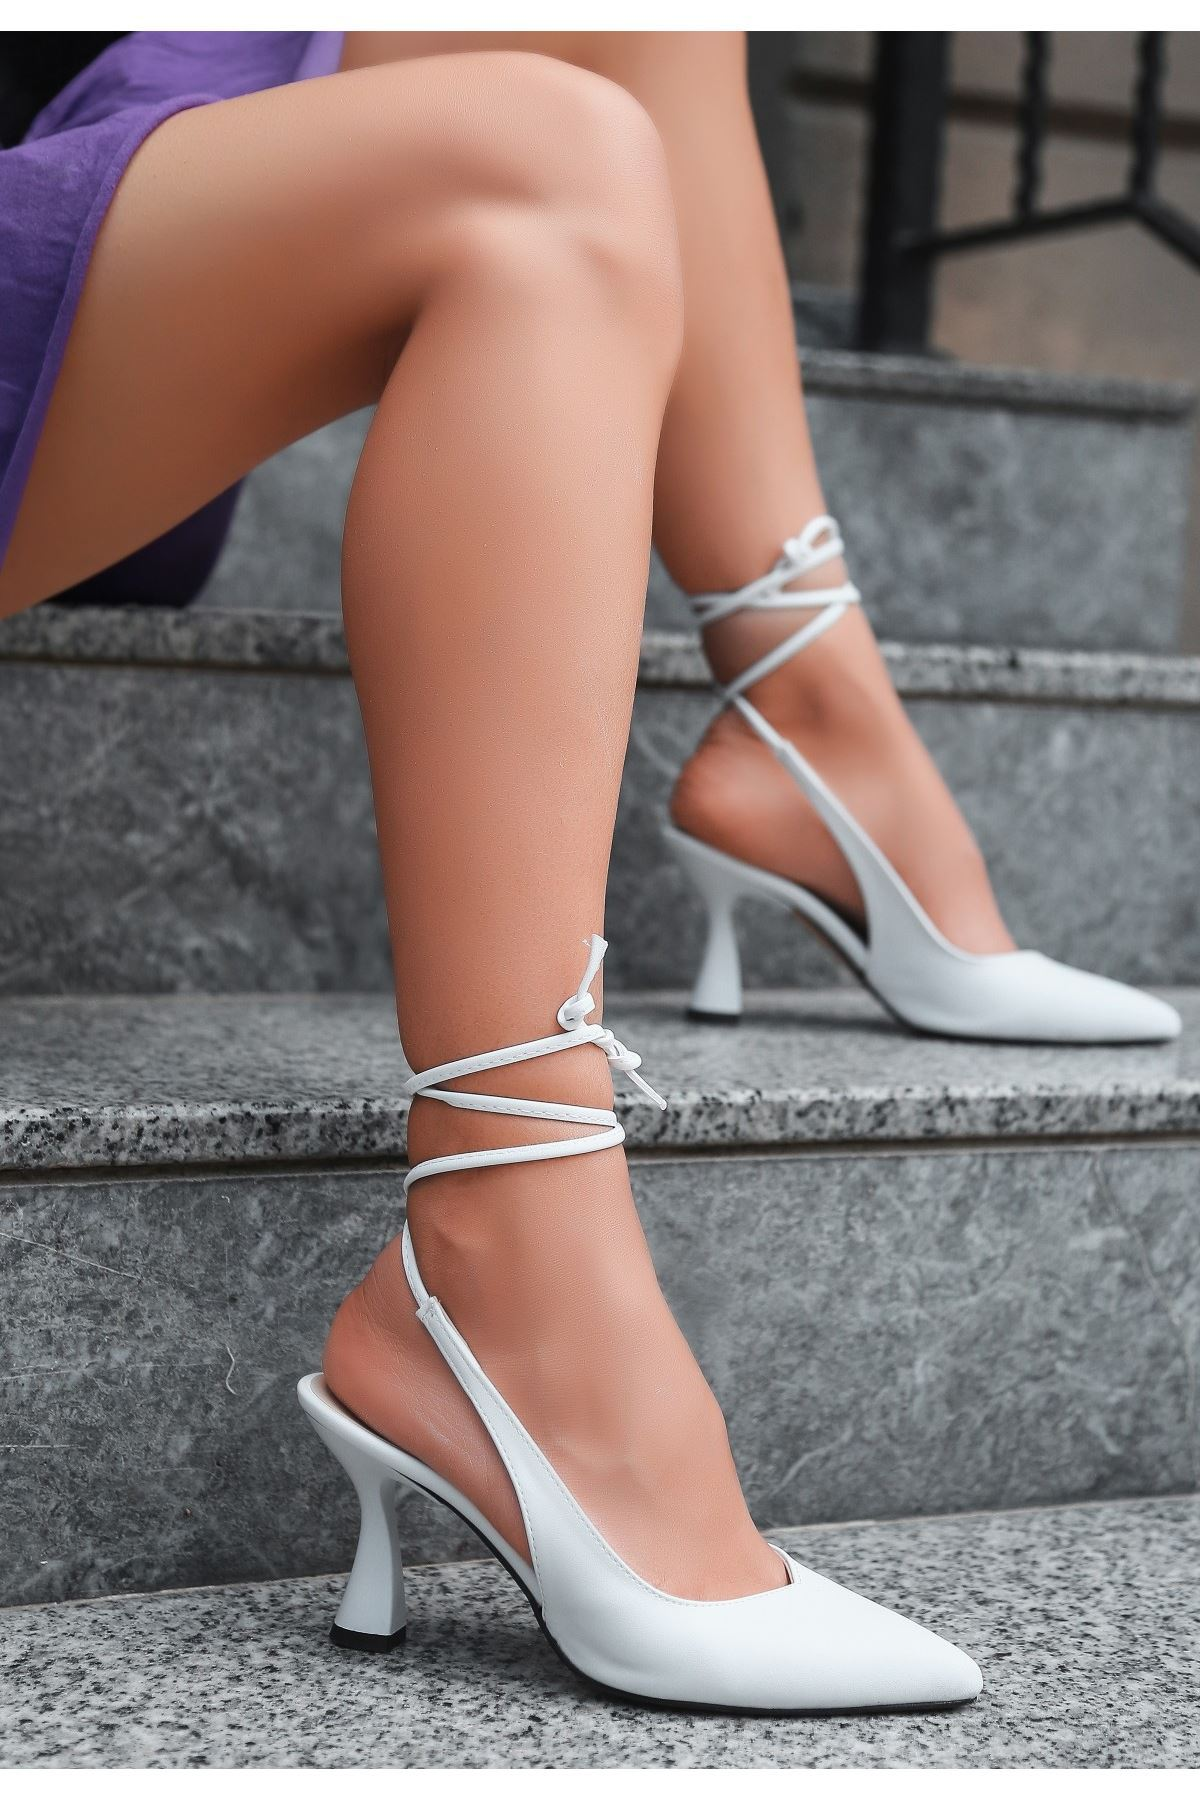 Wonna Beyaz Cilt Topuklu Ayakkabı